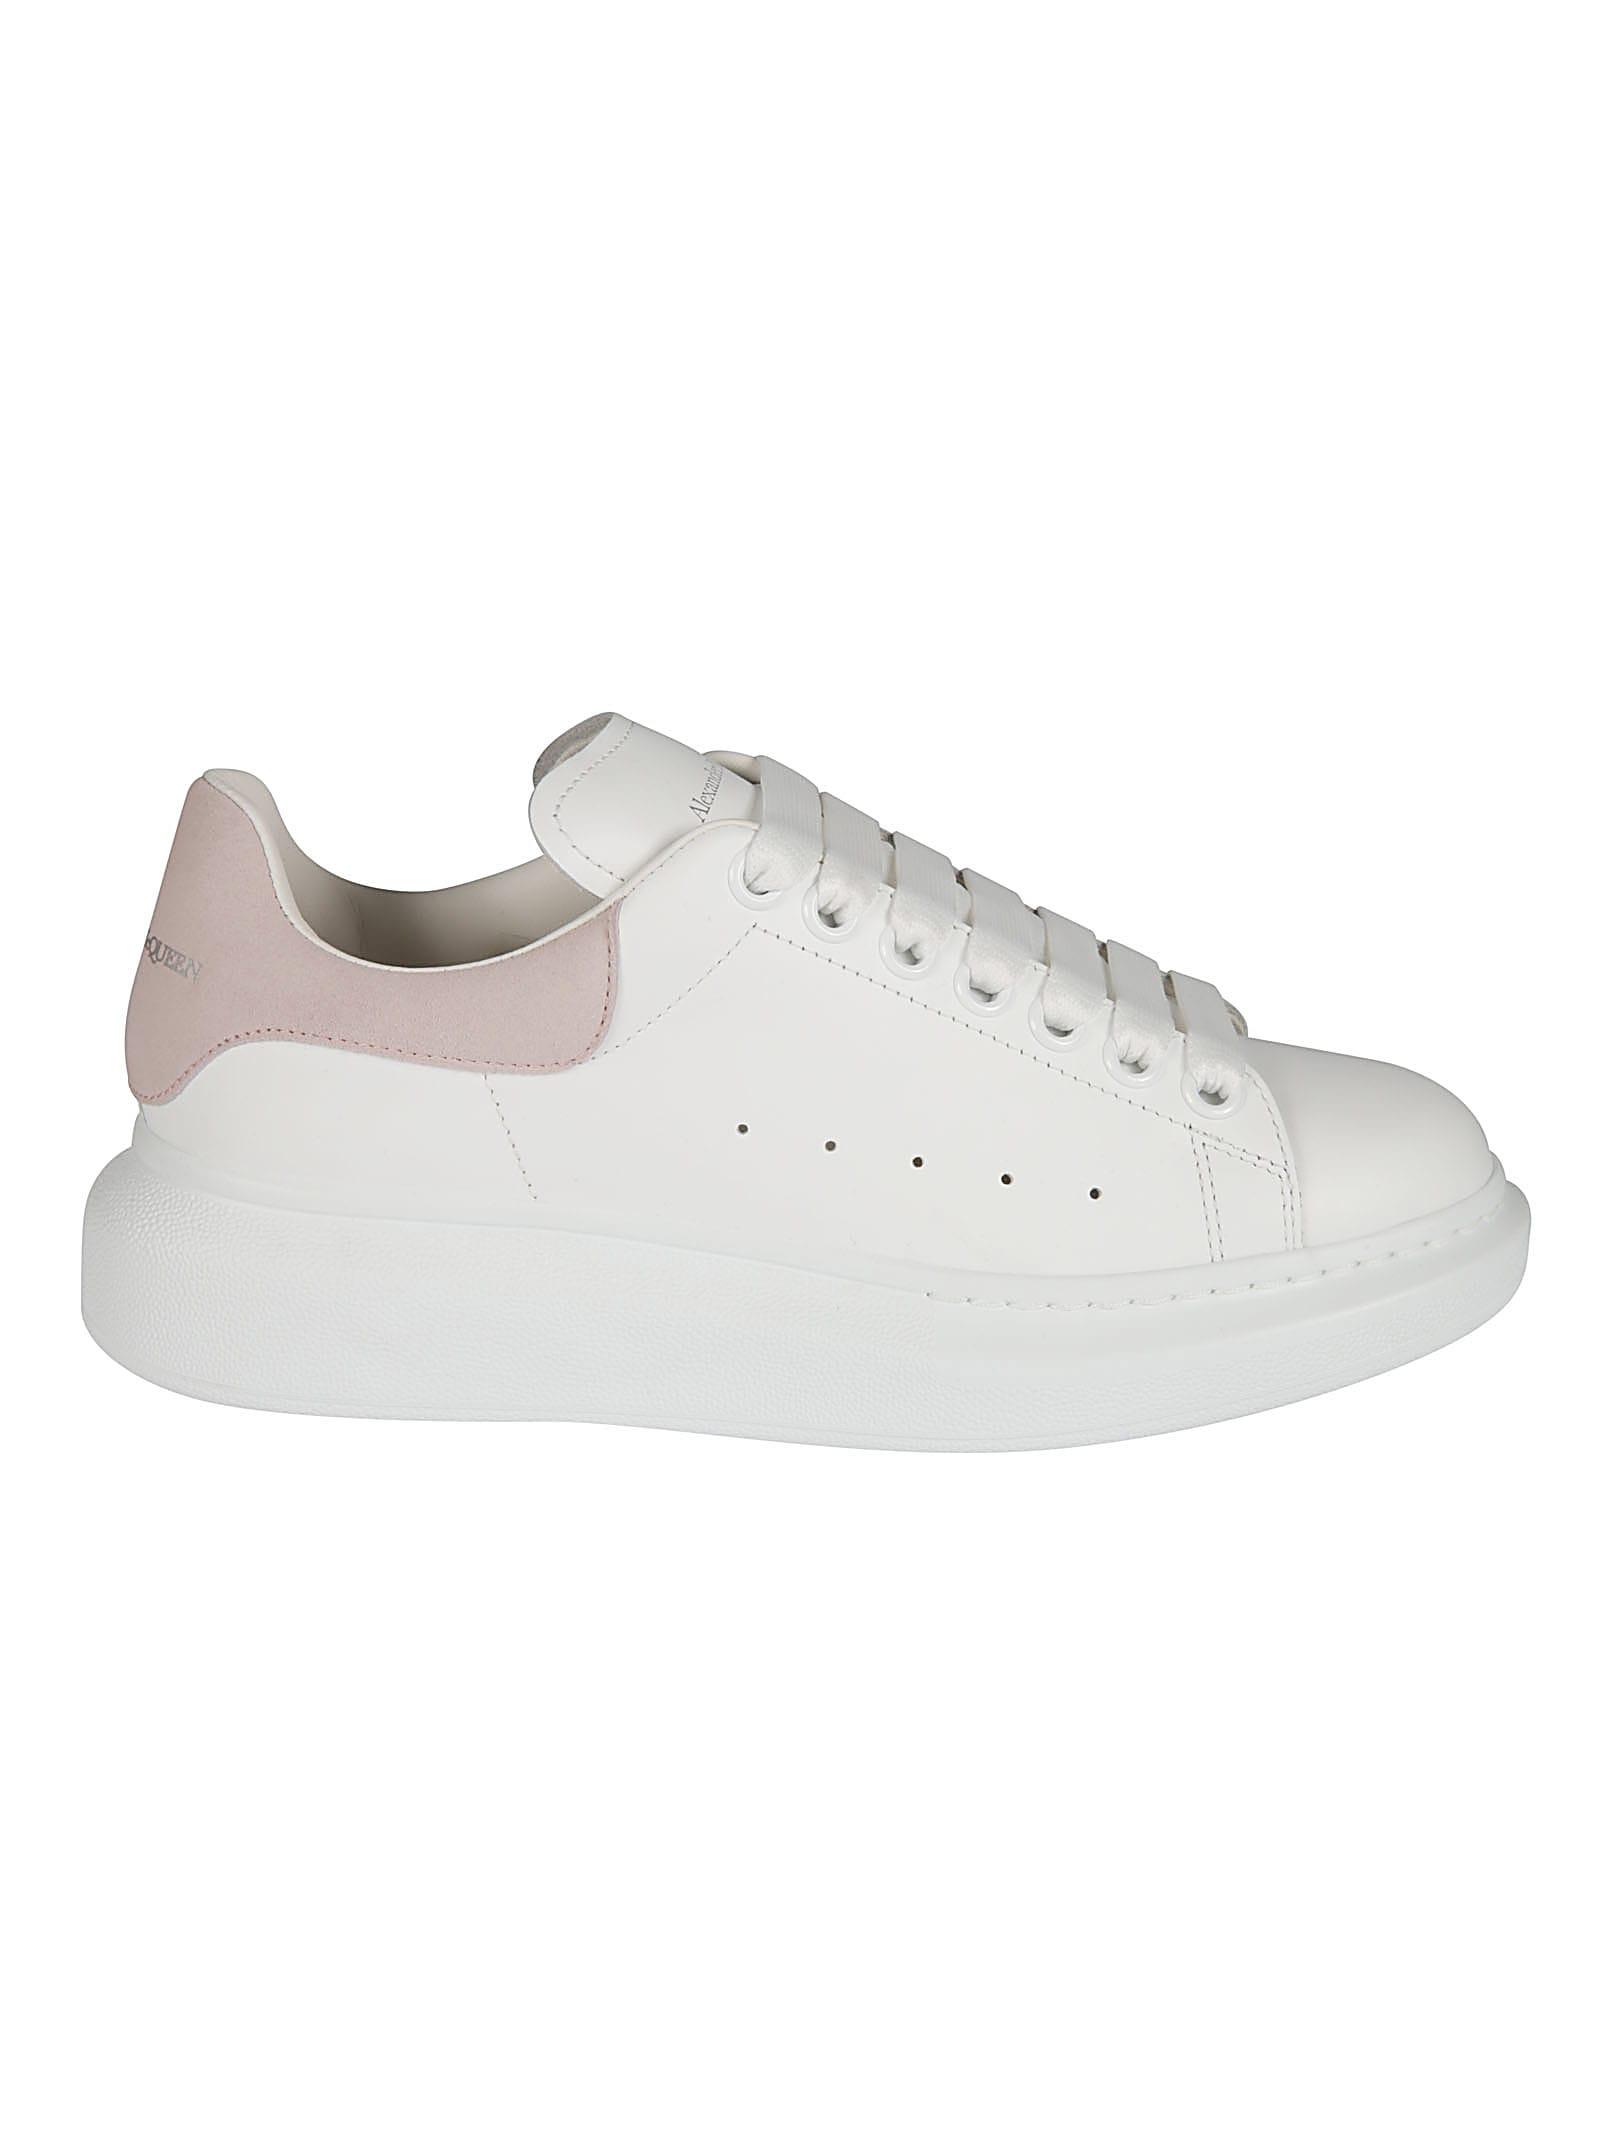 Buy Alexander McQueen Colour Block Sneakers online, shop Alexander McQueen shoes with free shipping